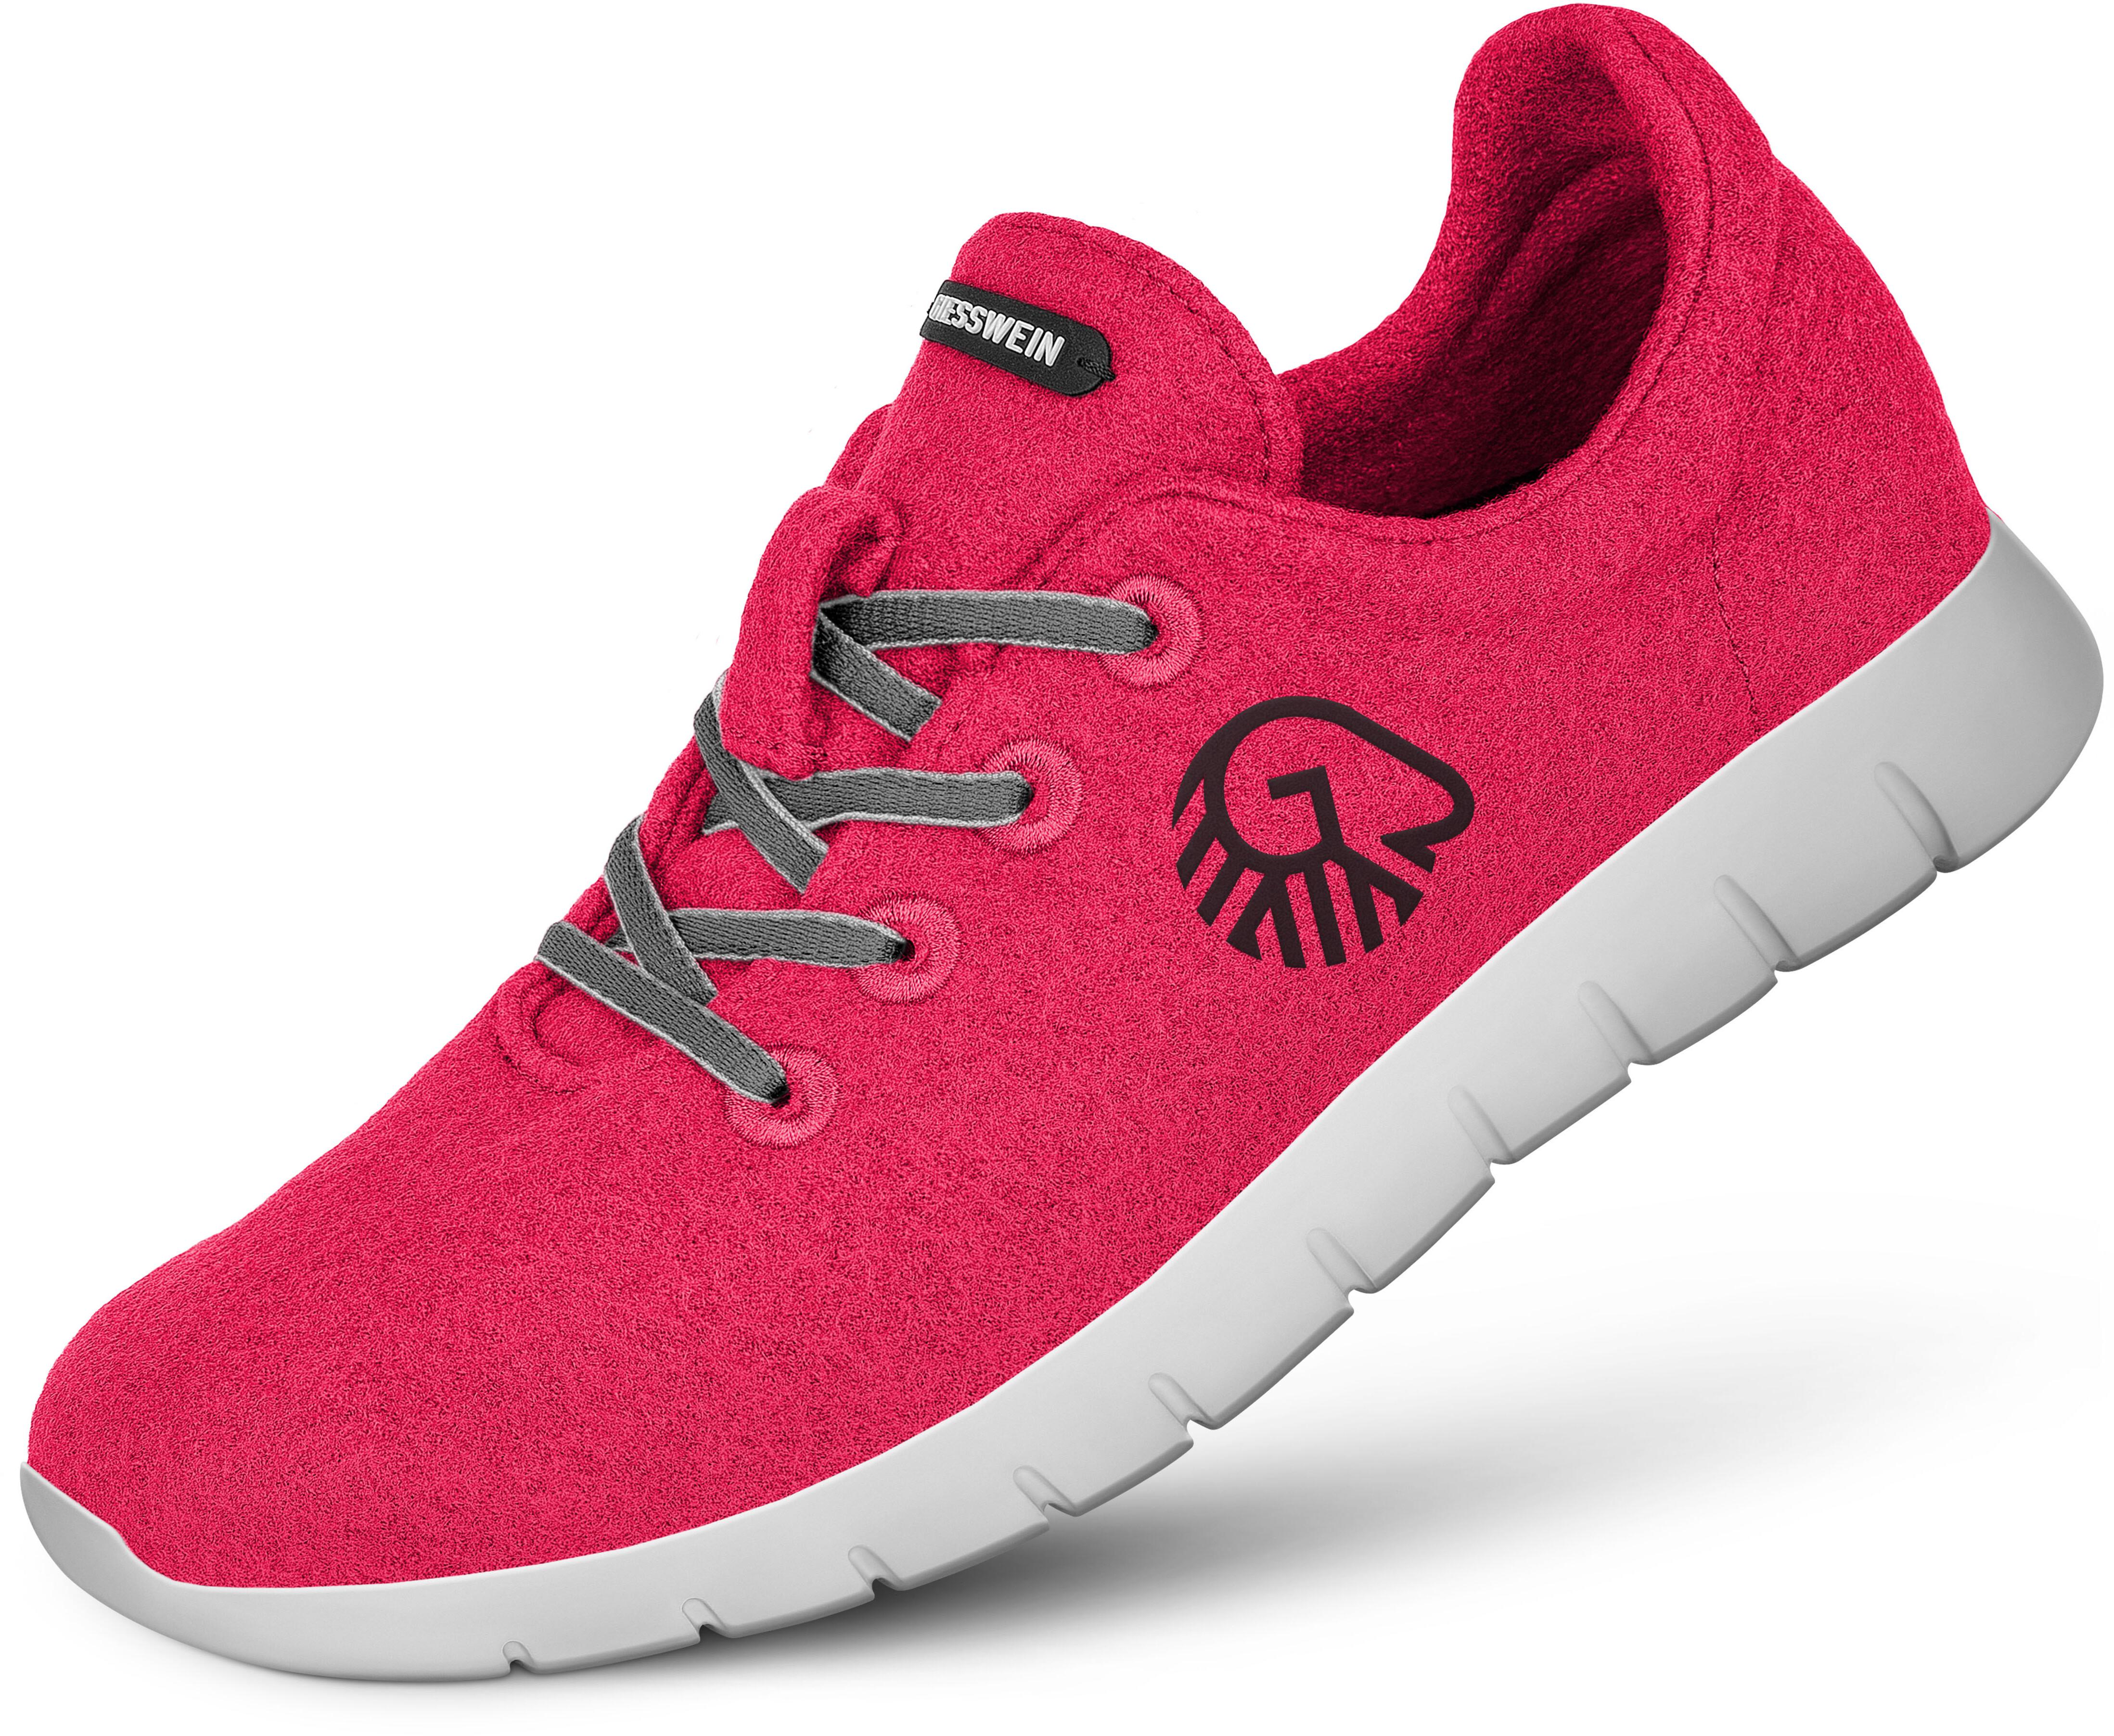 b2beed8349c3 Giesswein Merino Wool - Chaussures Femme - rose sur CAMPZ !